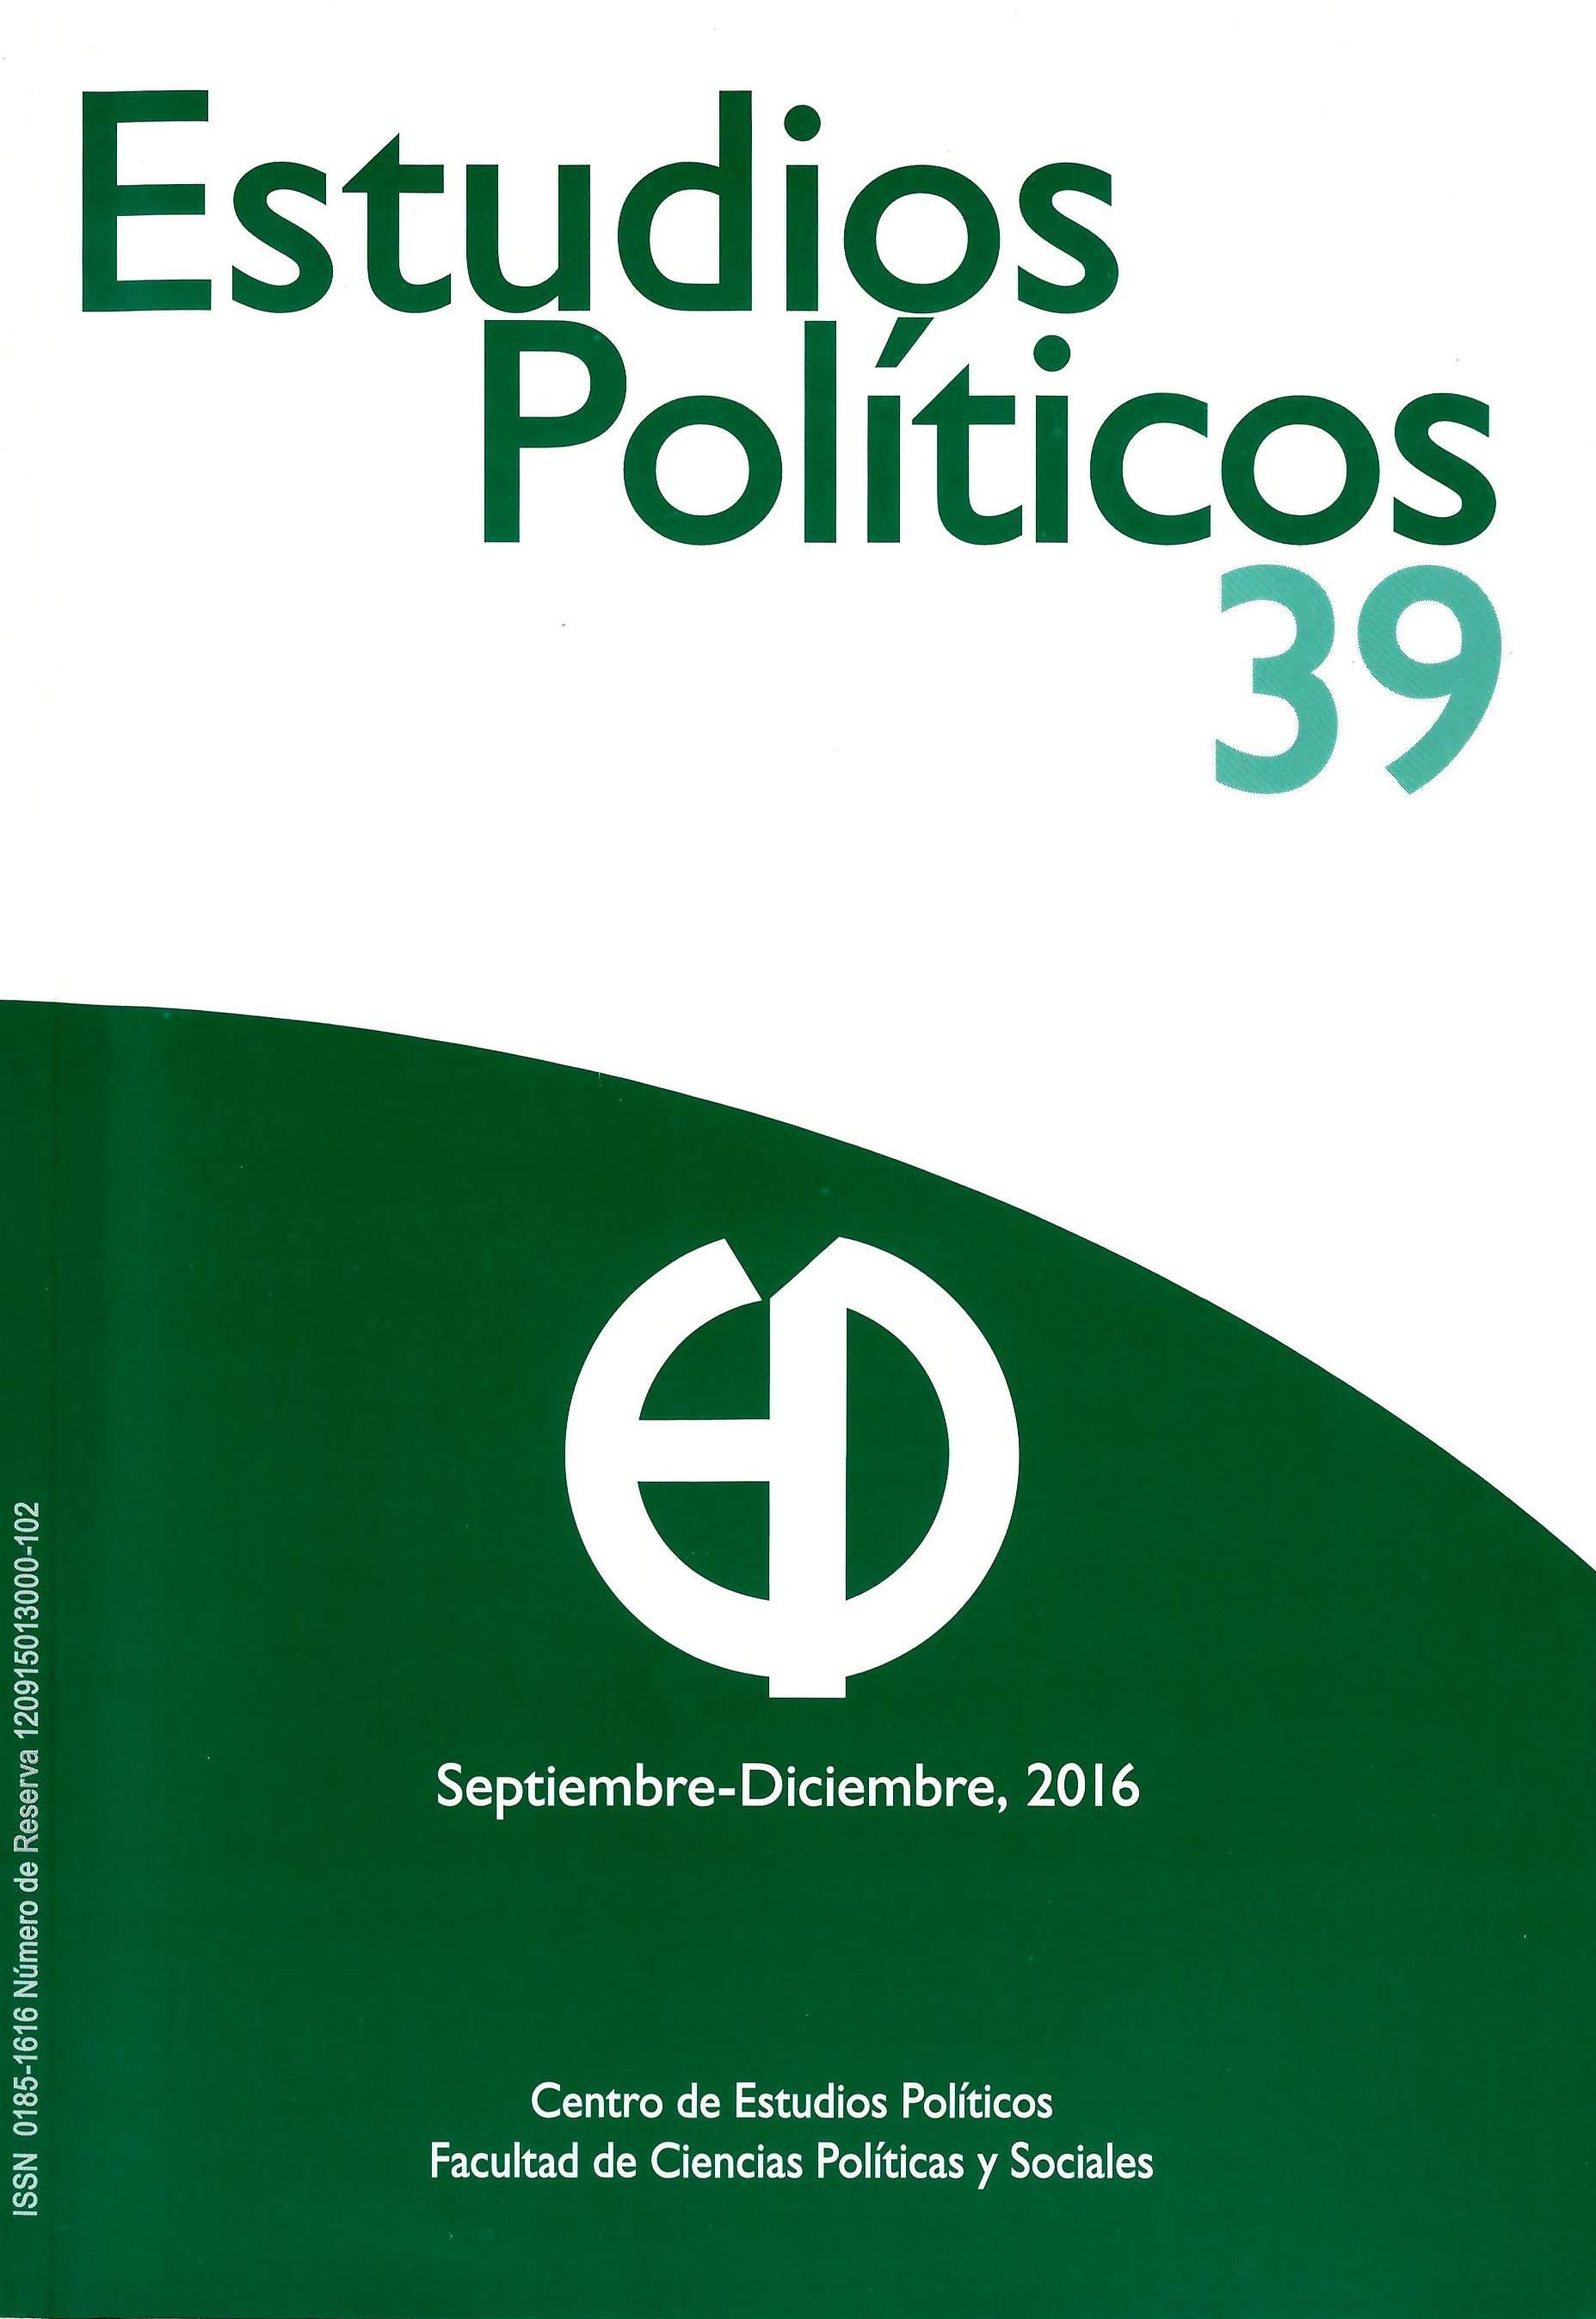 Estudios políticos, núm. 39, novena época, septiembre-diciembre 2016